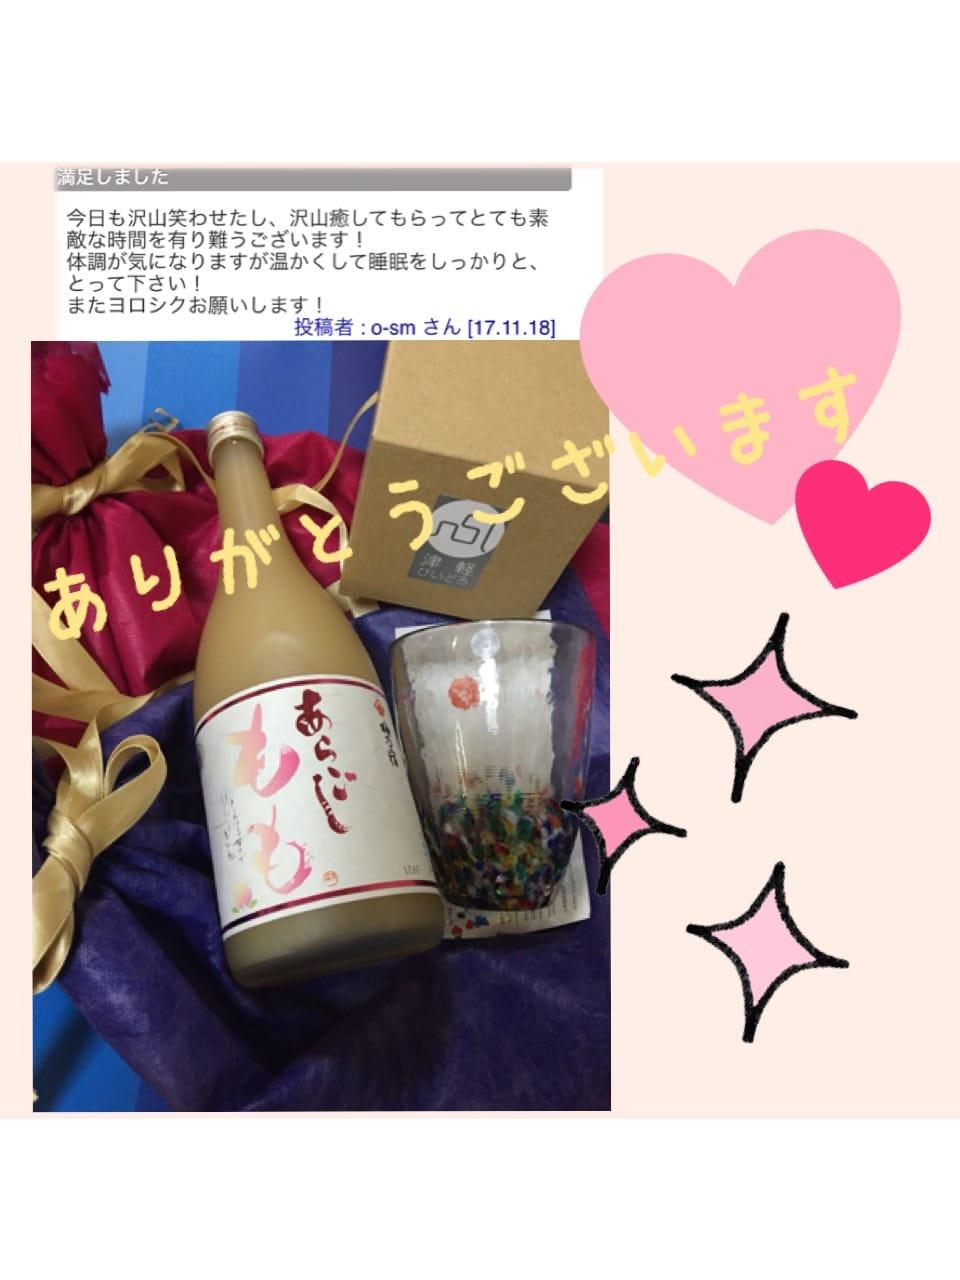 Kotoha(ことは)「げんき」11/19(日) 10:03 | Kotoha(ことは)の写メ・風俗動画